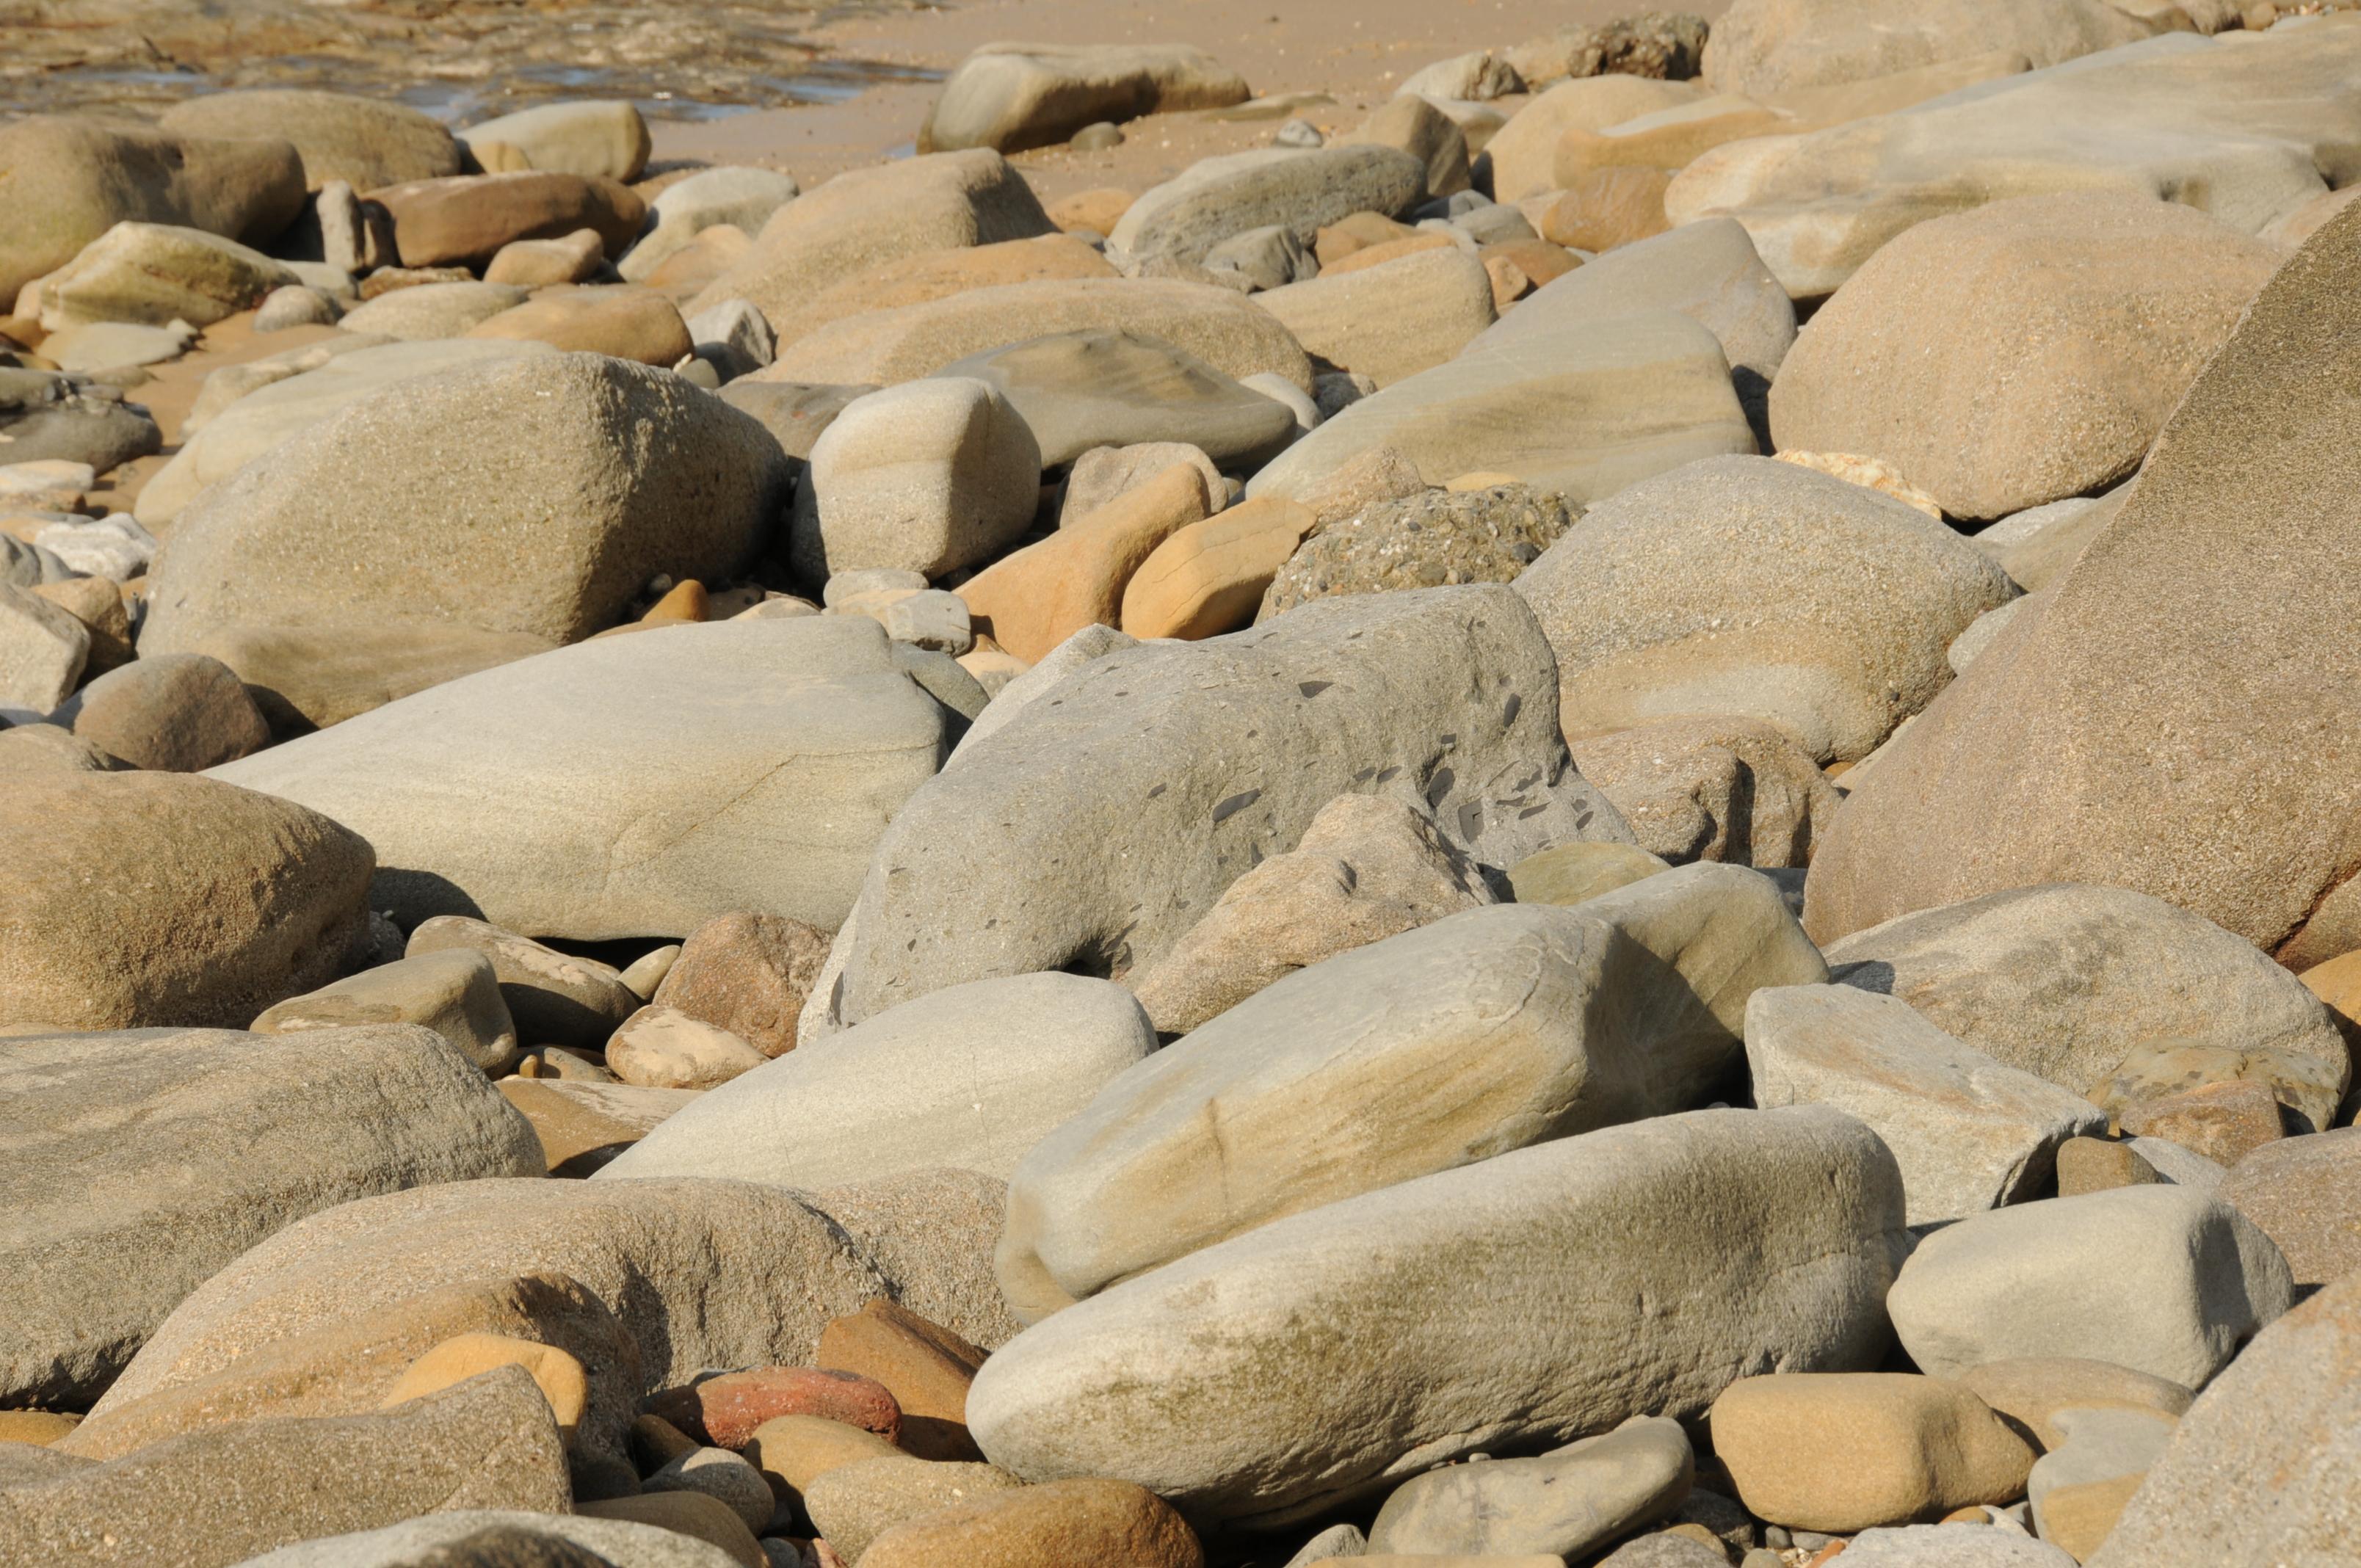 Beach Rocks, Beach, Rocks, Stones, HQ Photo